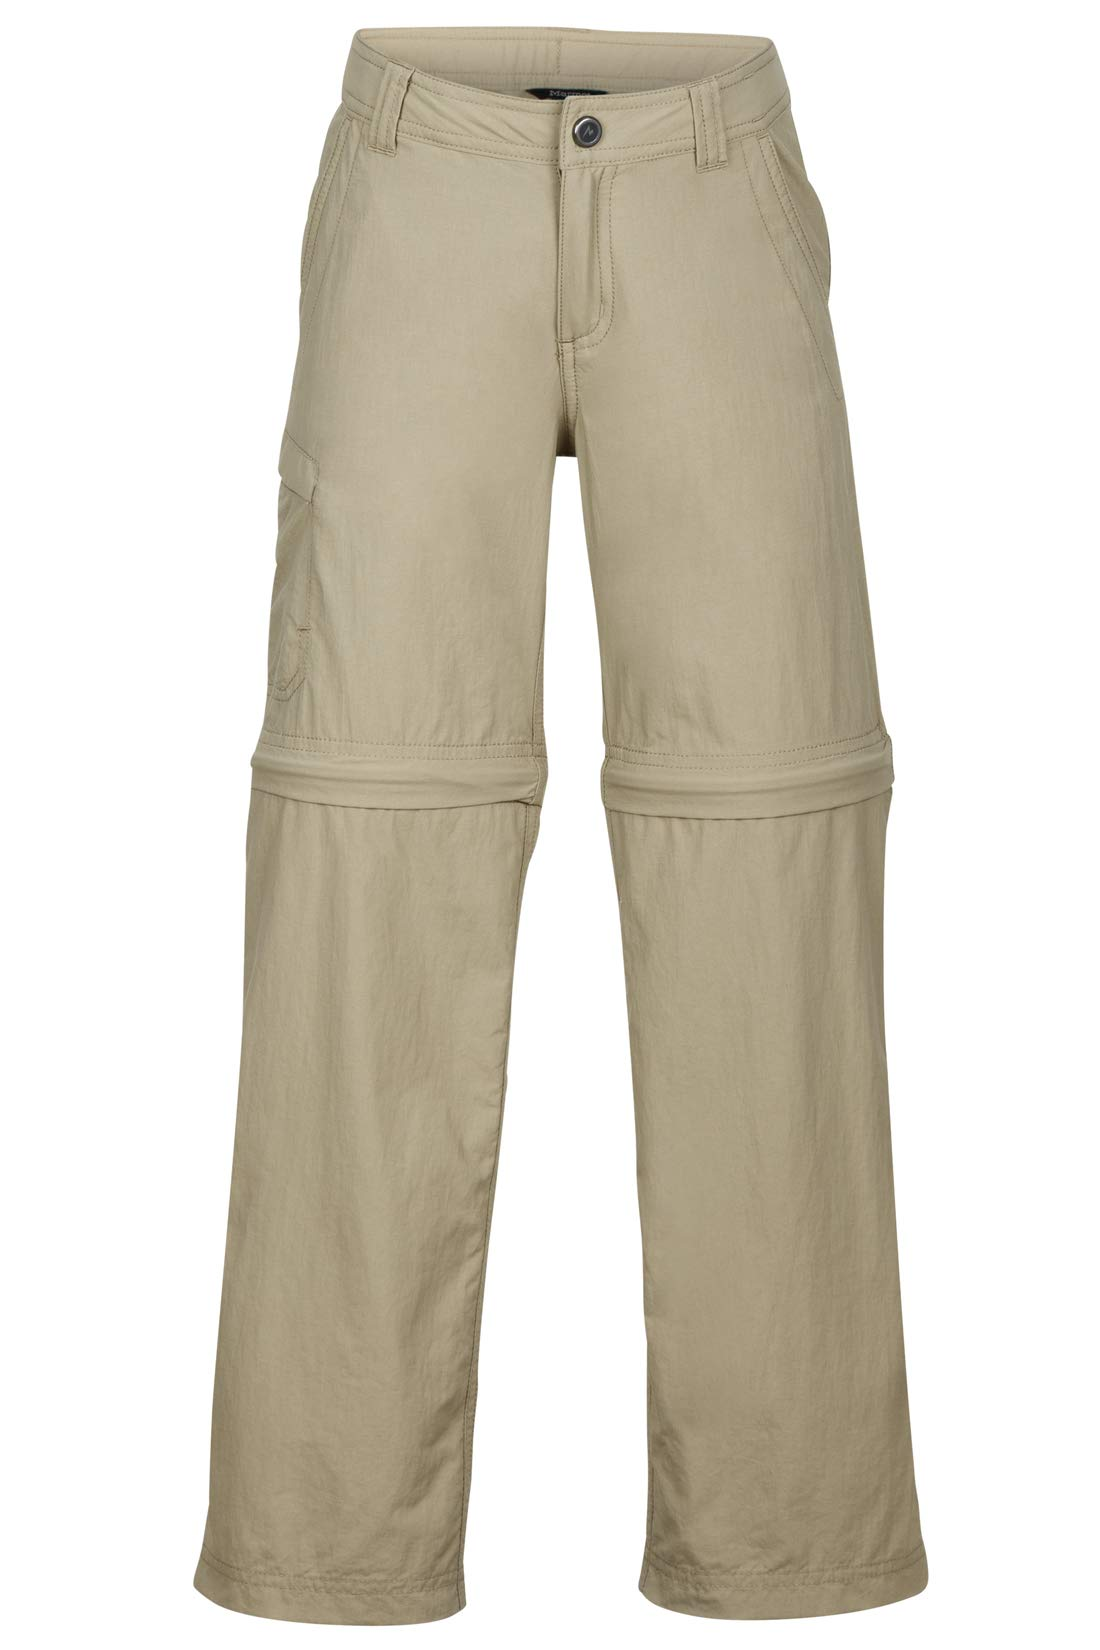 Marmot Kid's Cruz Convertible Pant